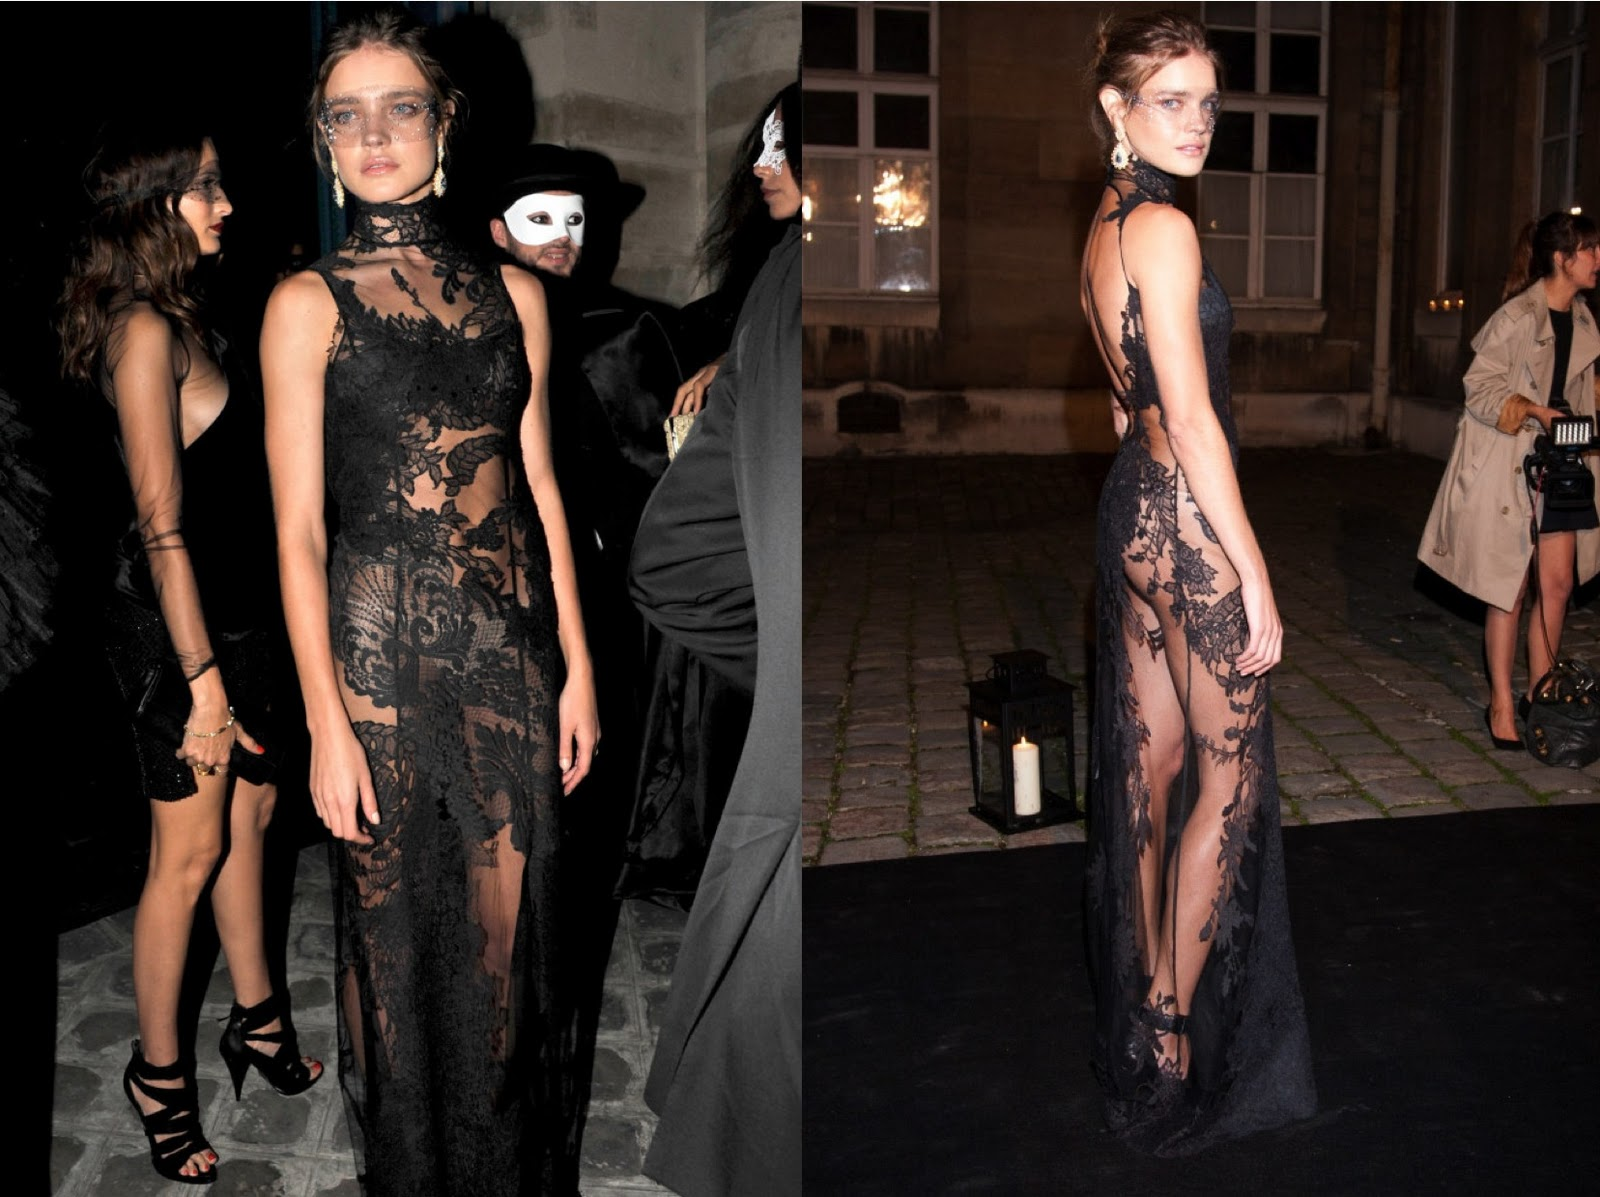 http://4.bp.blogspot.com/_PfmV3qvy8FY/TRzyPcYHLZI/AAAAAAAAAs4/fHmU5xkq31k/s1600/la+modella+mafia+Vogue+Masquerade+Ball+Natalia+Vodianova.jpg